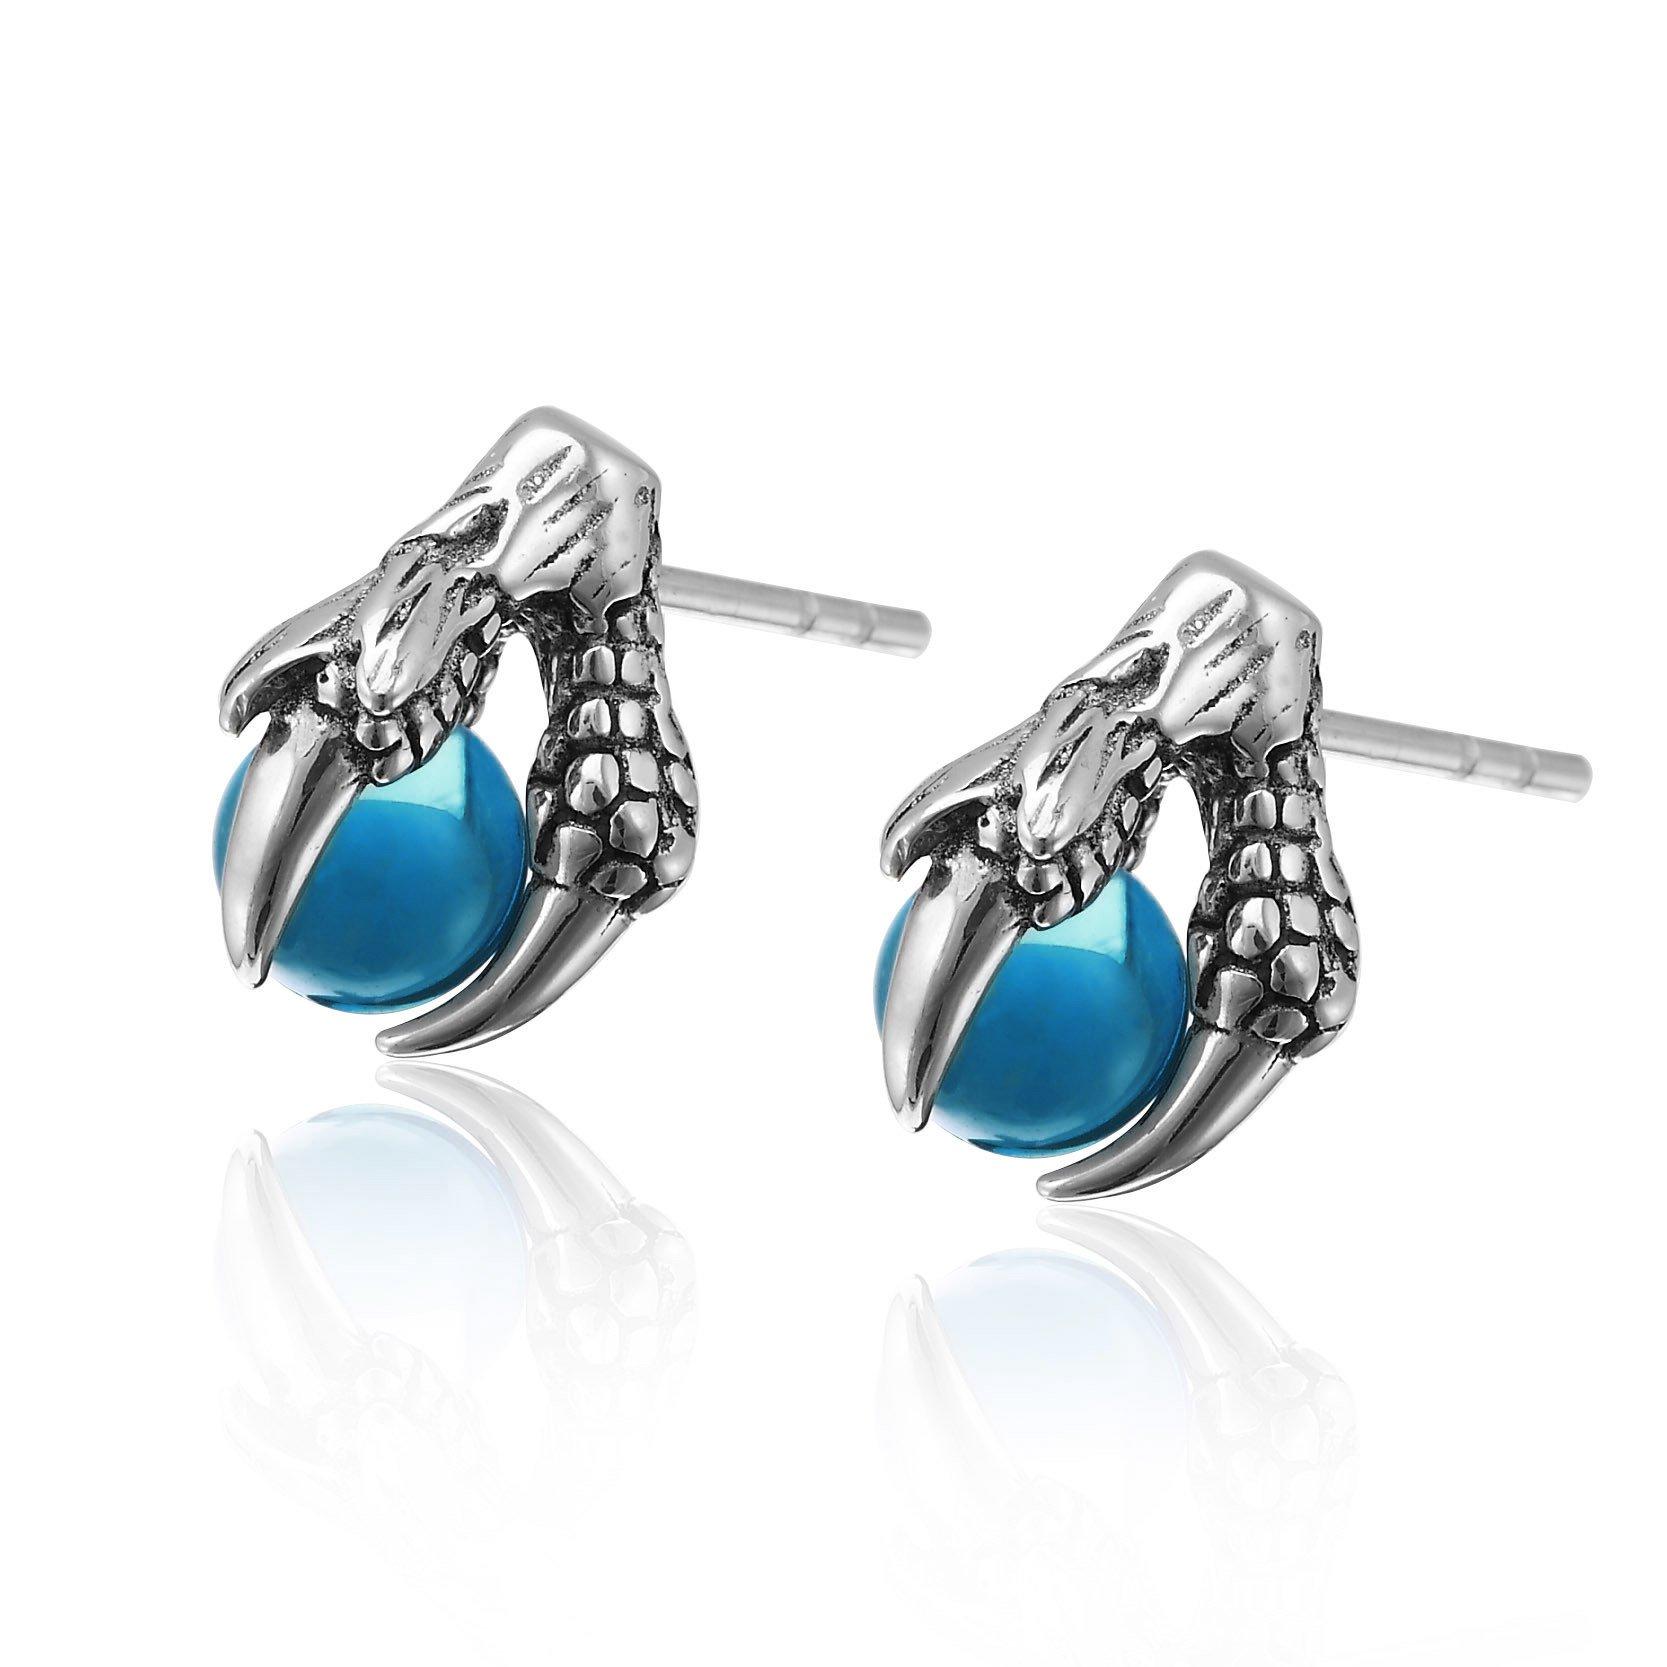 Vintage Stainless Steel Dragon Claw Mens Womens Stud Earrings